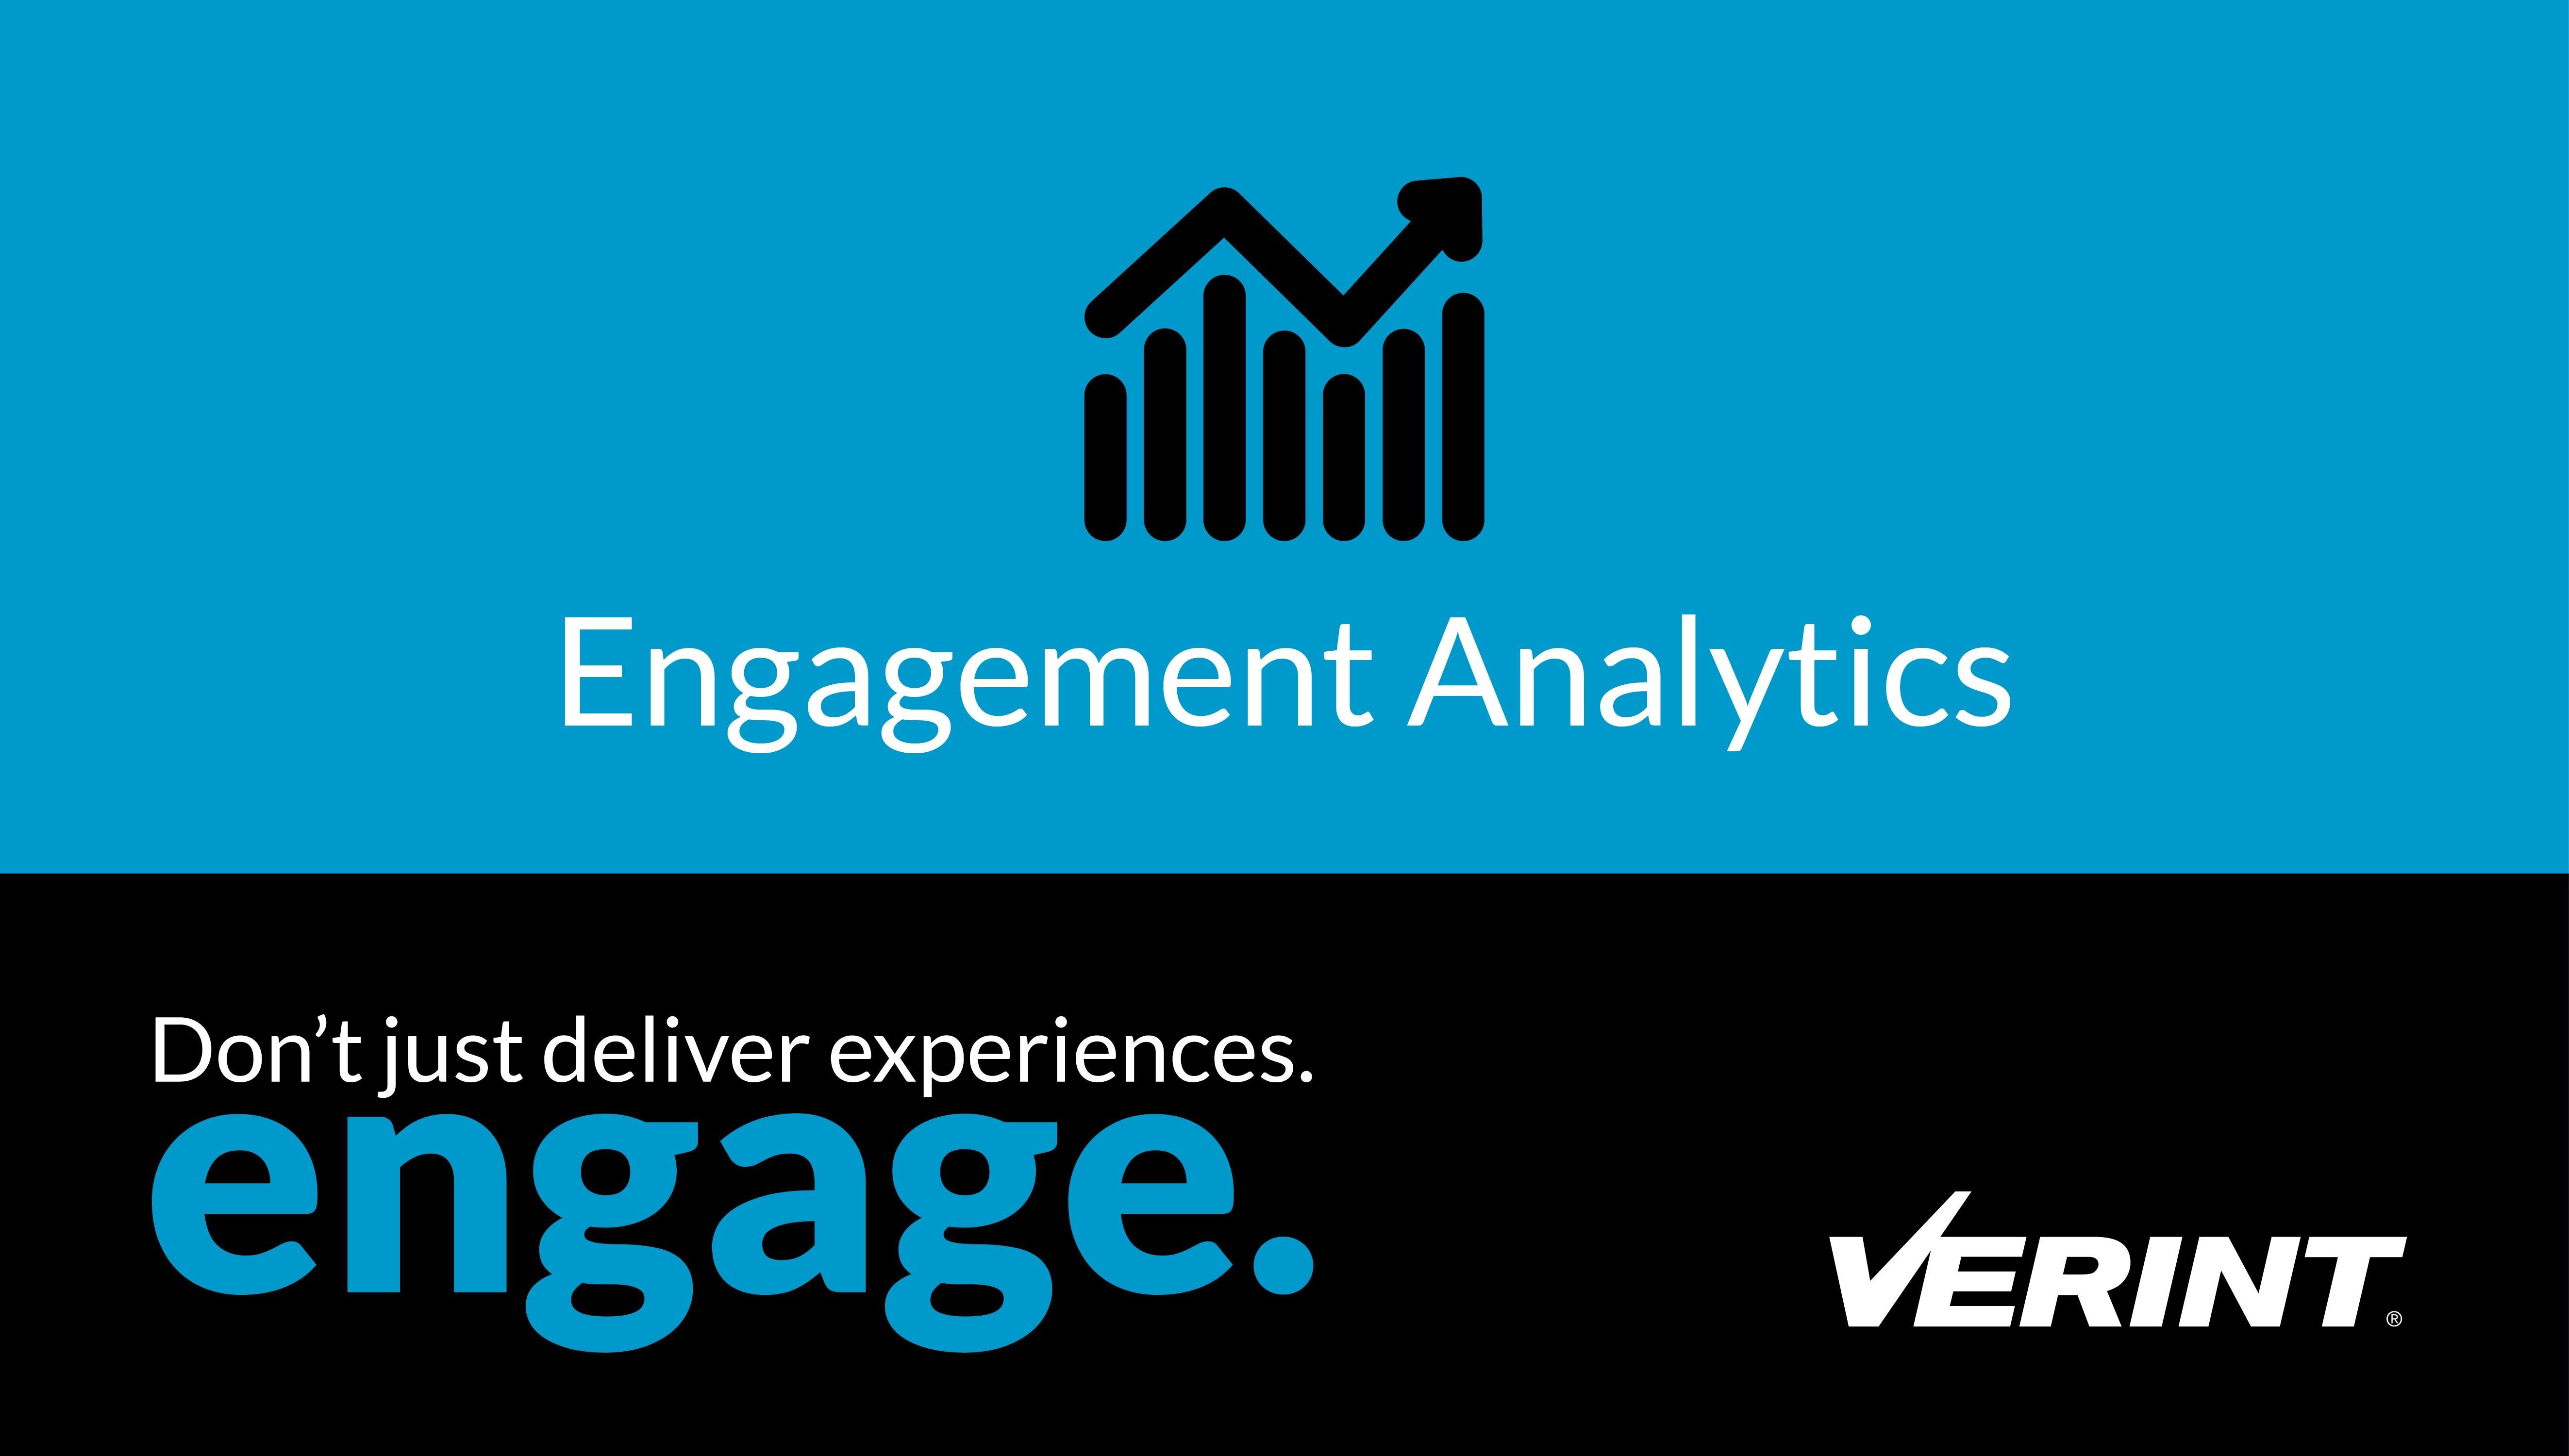 Verint Engagement Analytics